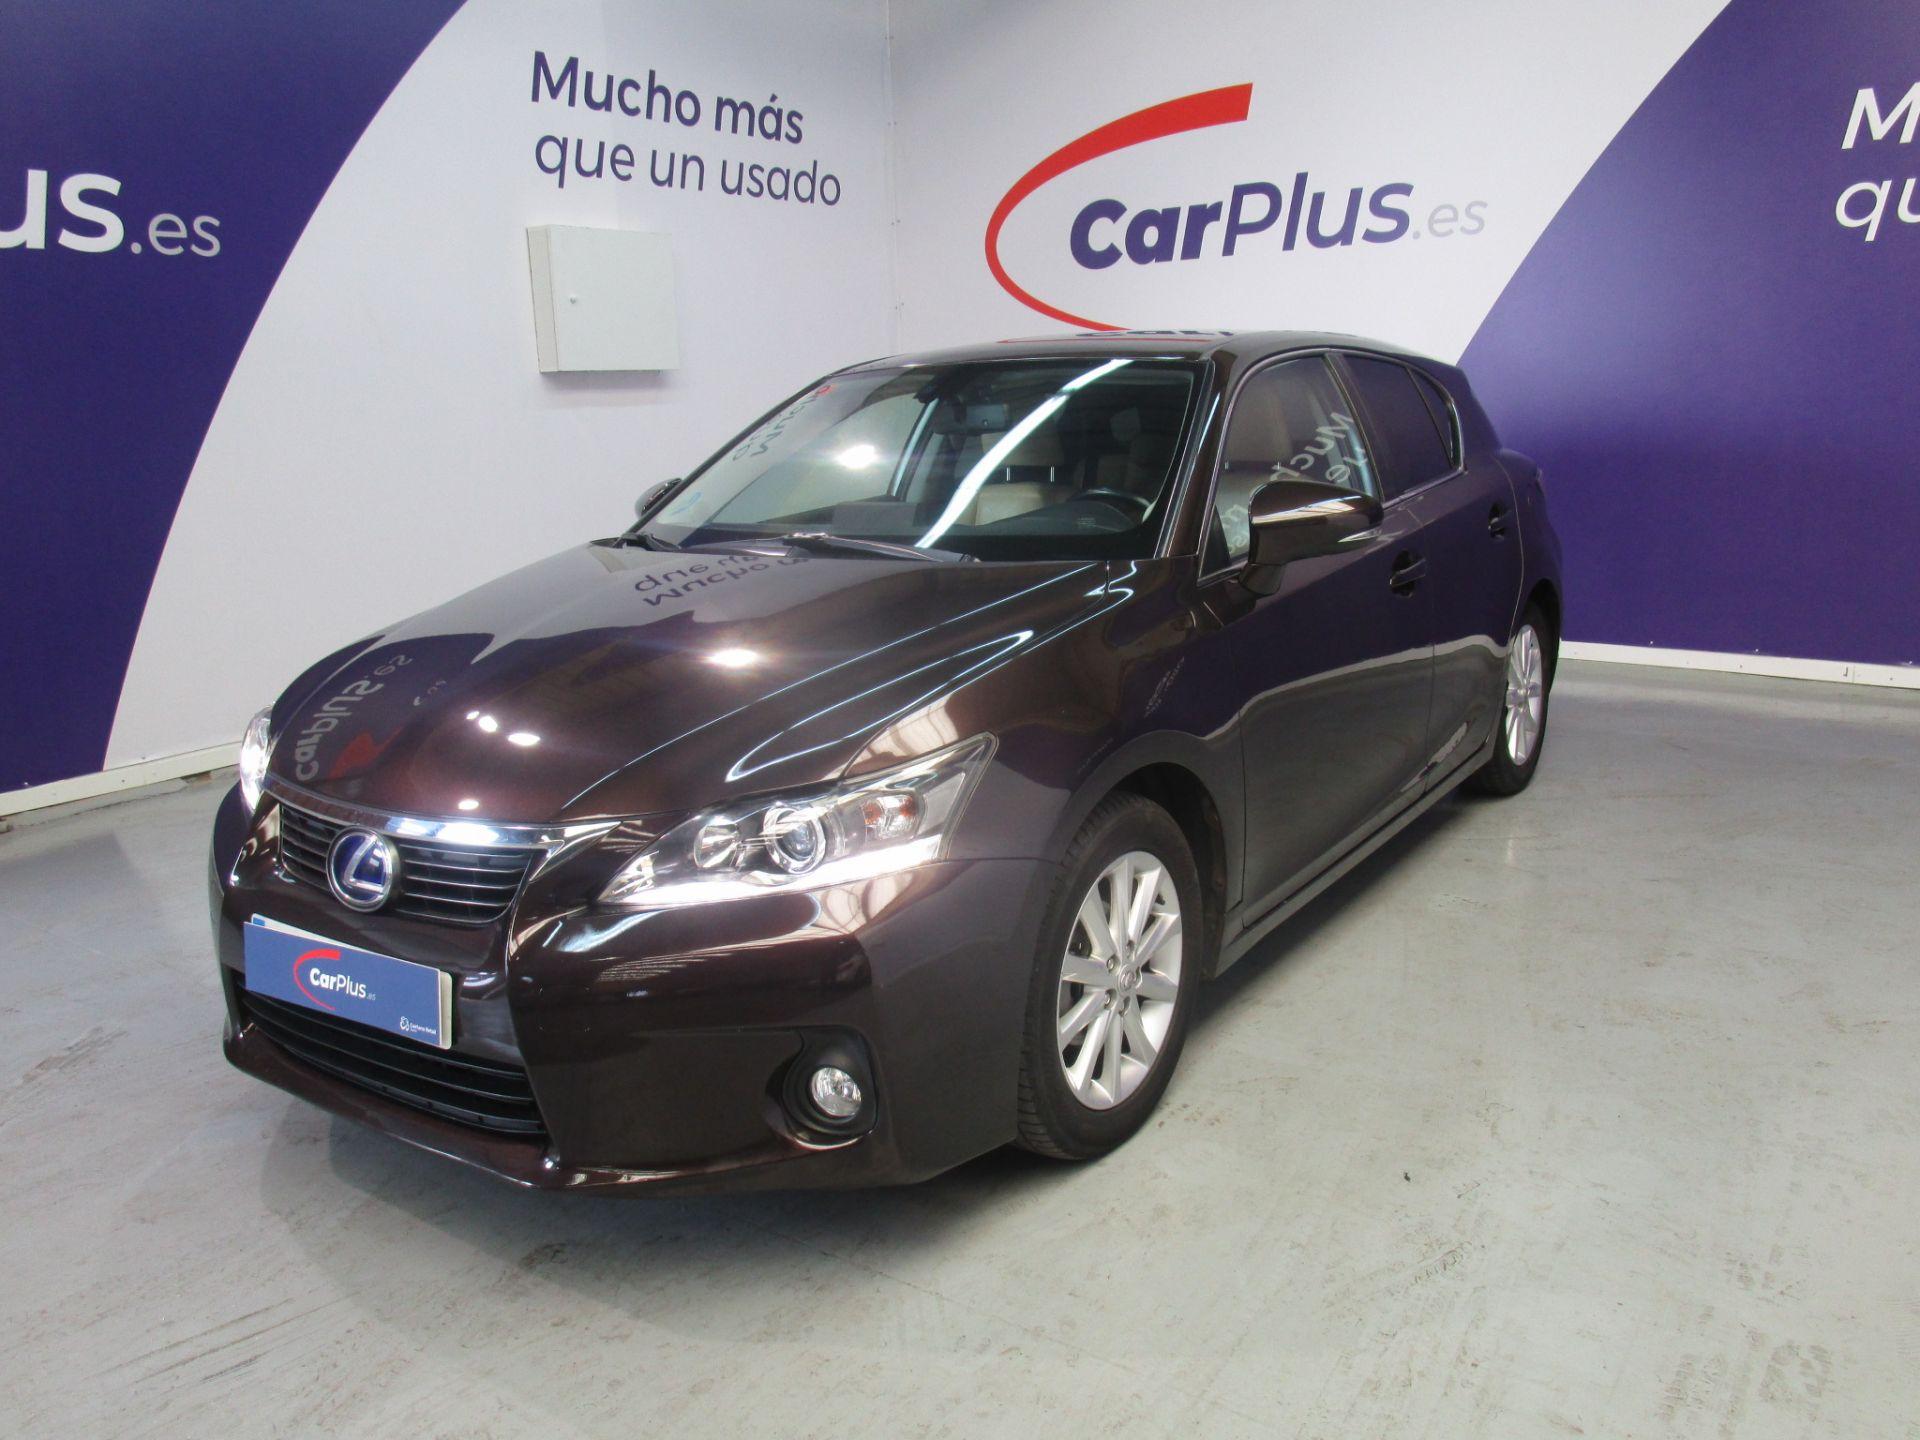 Lexus CT 200h Pack Hybrid Drive segunda mano Madrid